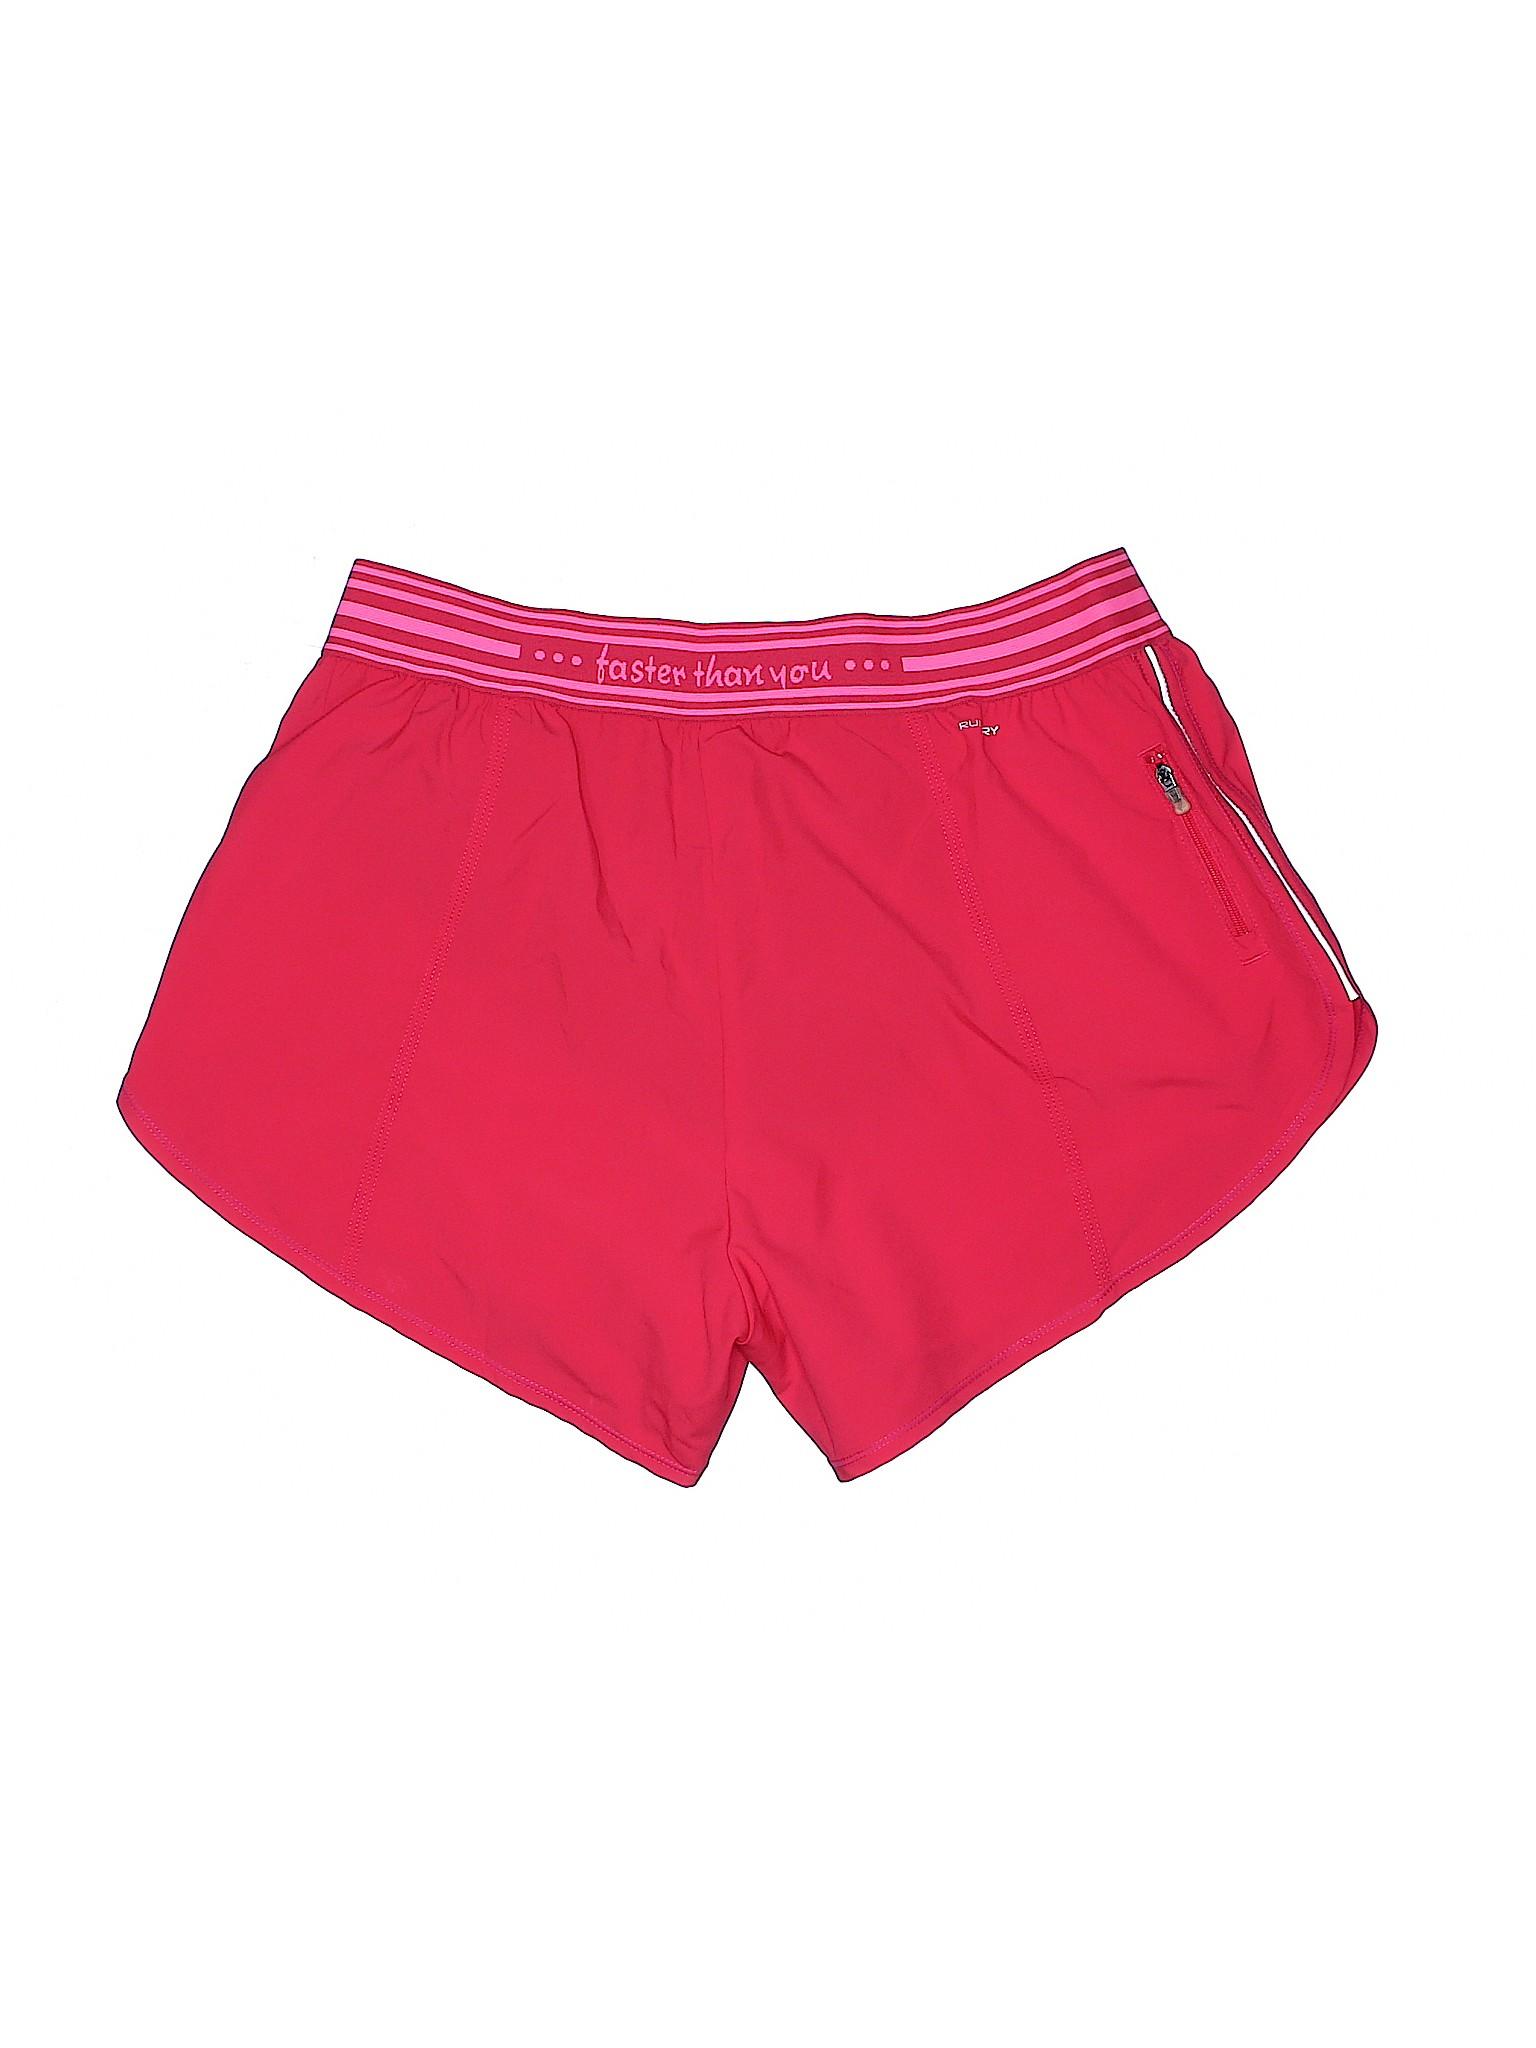 Leisure Leisure Athletic winter Saucony winter Shorts Saucony rFxOrn04